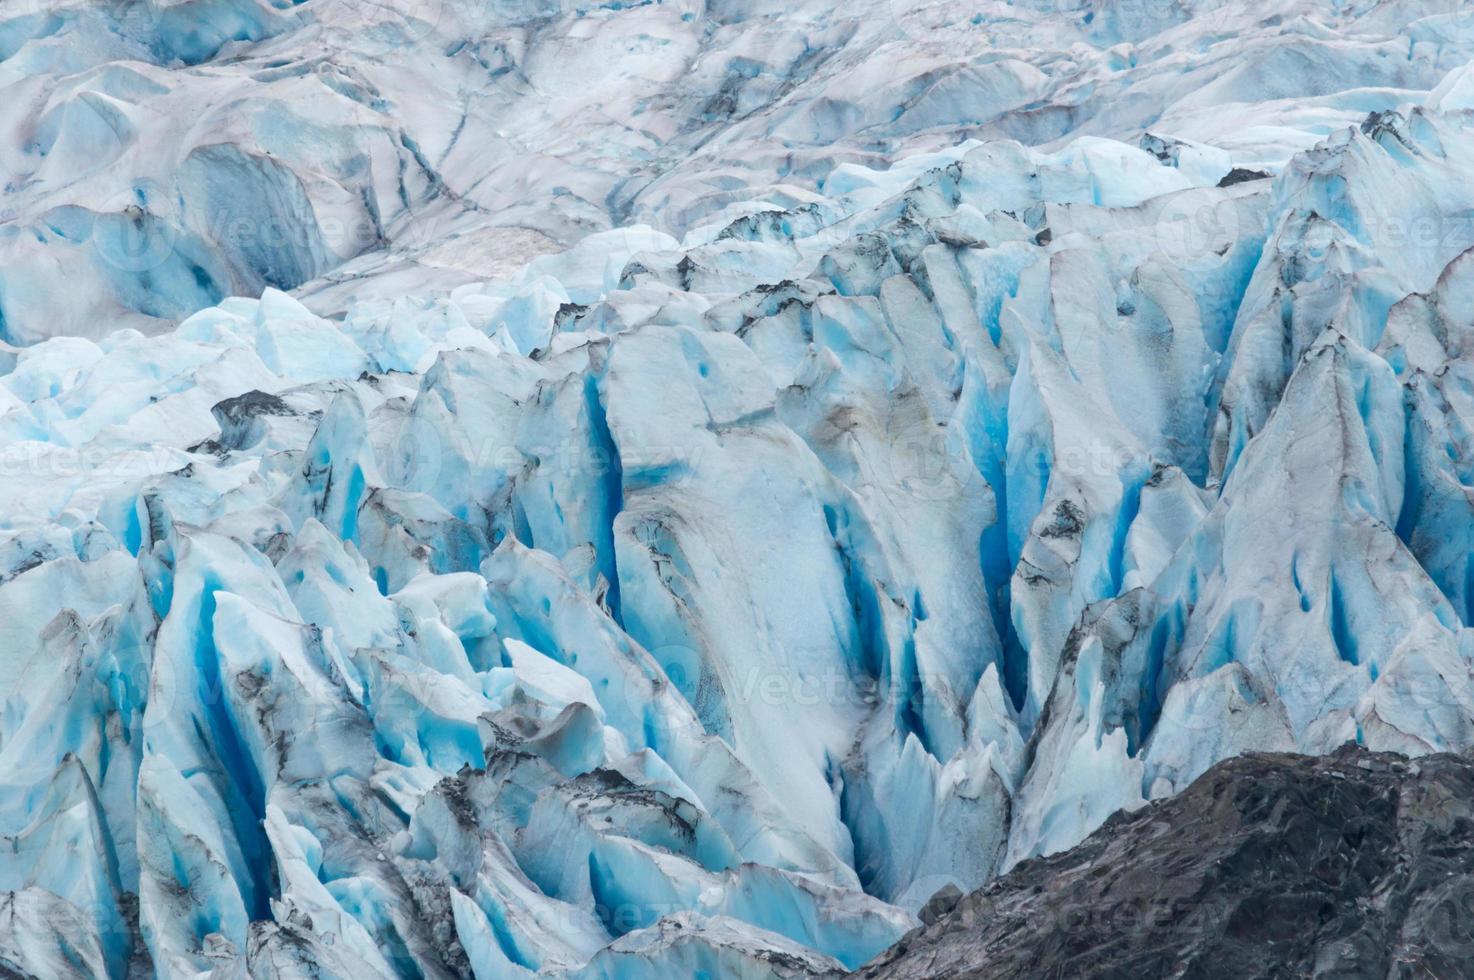 Glacial Ice photo